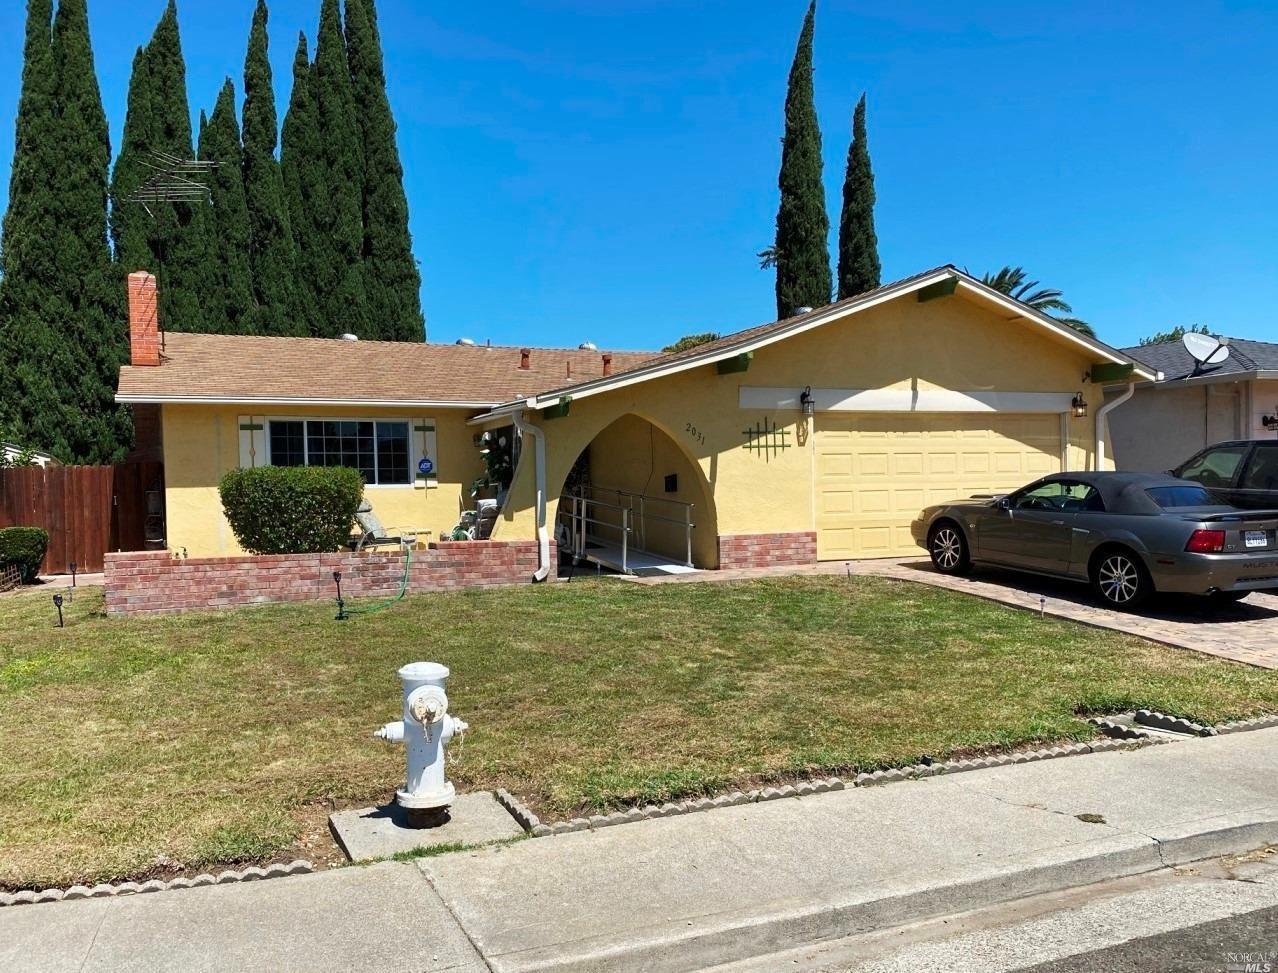 2031 Cormorant Drive, Fairfield, CA 94533 - MLS#: 321070586